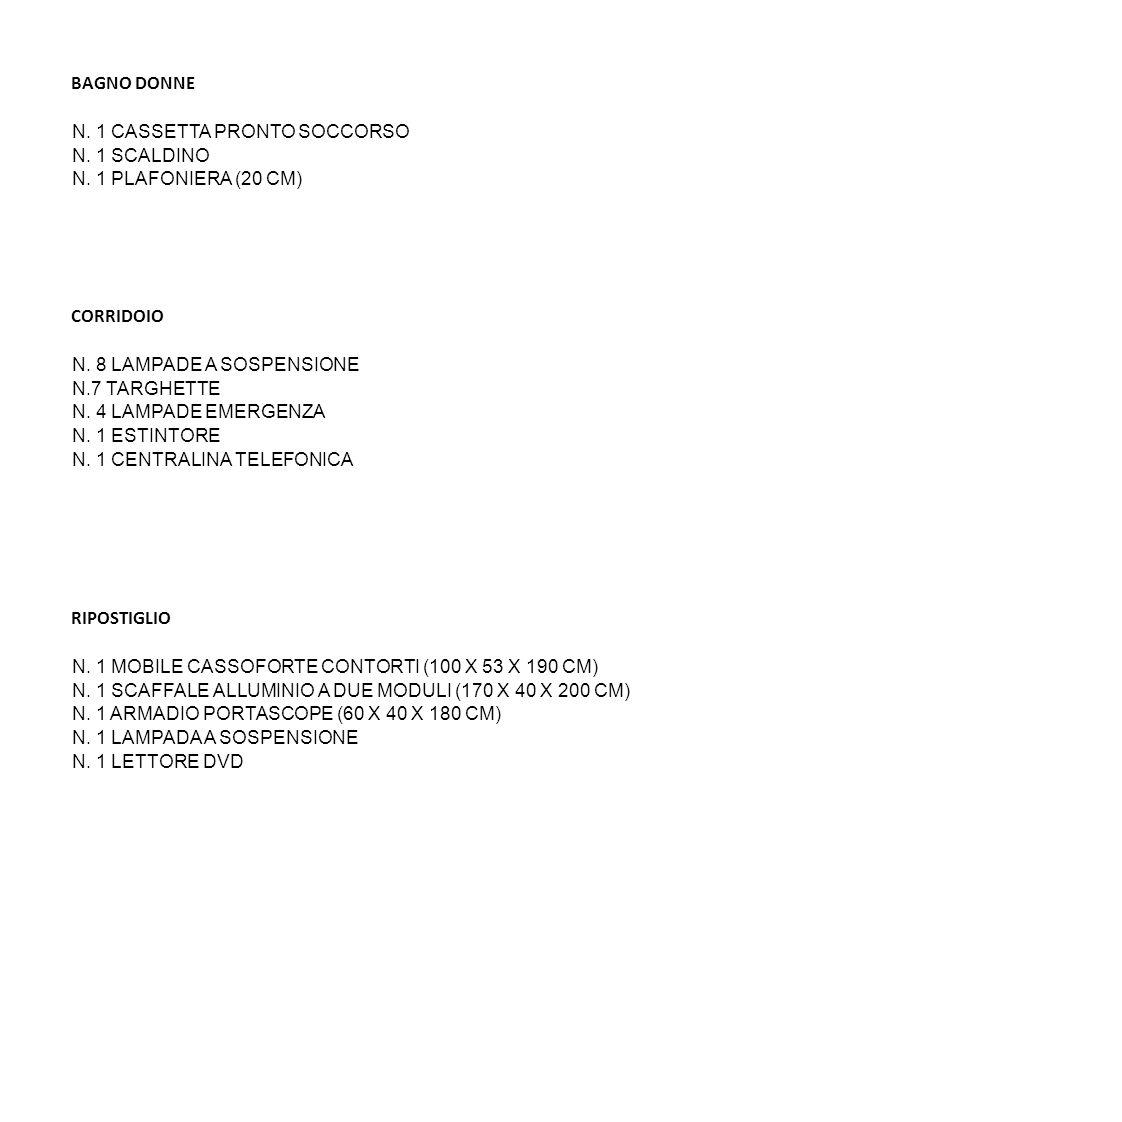 BAGNO DONNE N. 1 CASSETTA PRONTO SOCCORSO N. 1 SCALDINO N. 1 PLAFONIERA (20 CM) CORRIDOIO N. 8 LAMPADE A SOSPENSIONE N.7 TARGHETTE N. 4 LAMPADE EMERGE